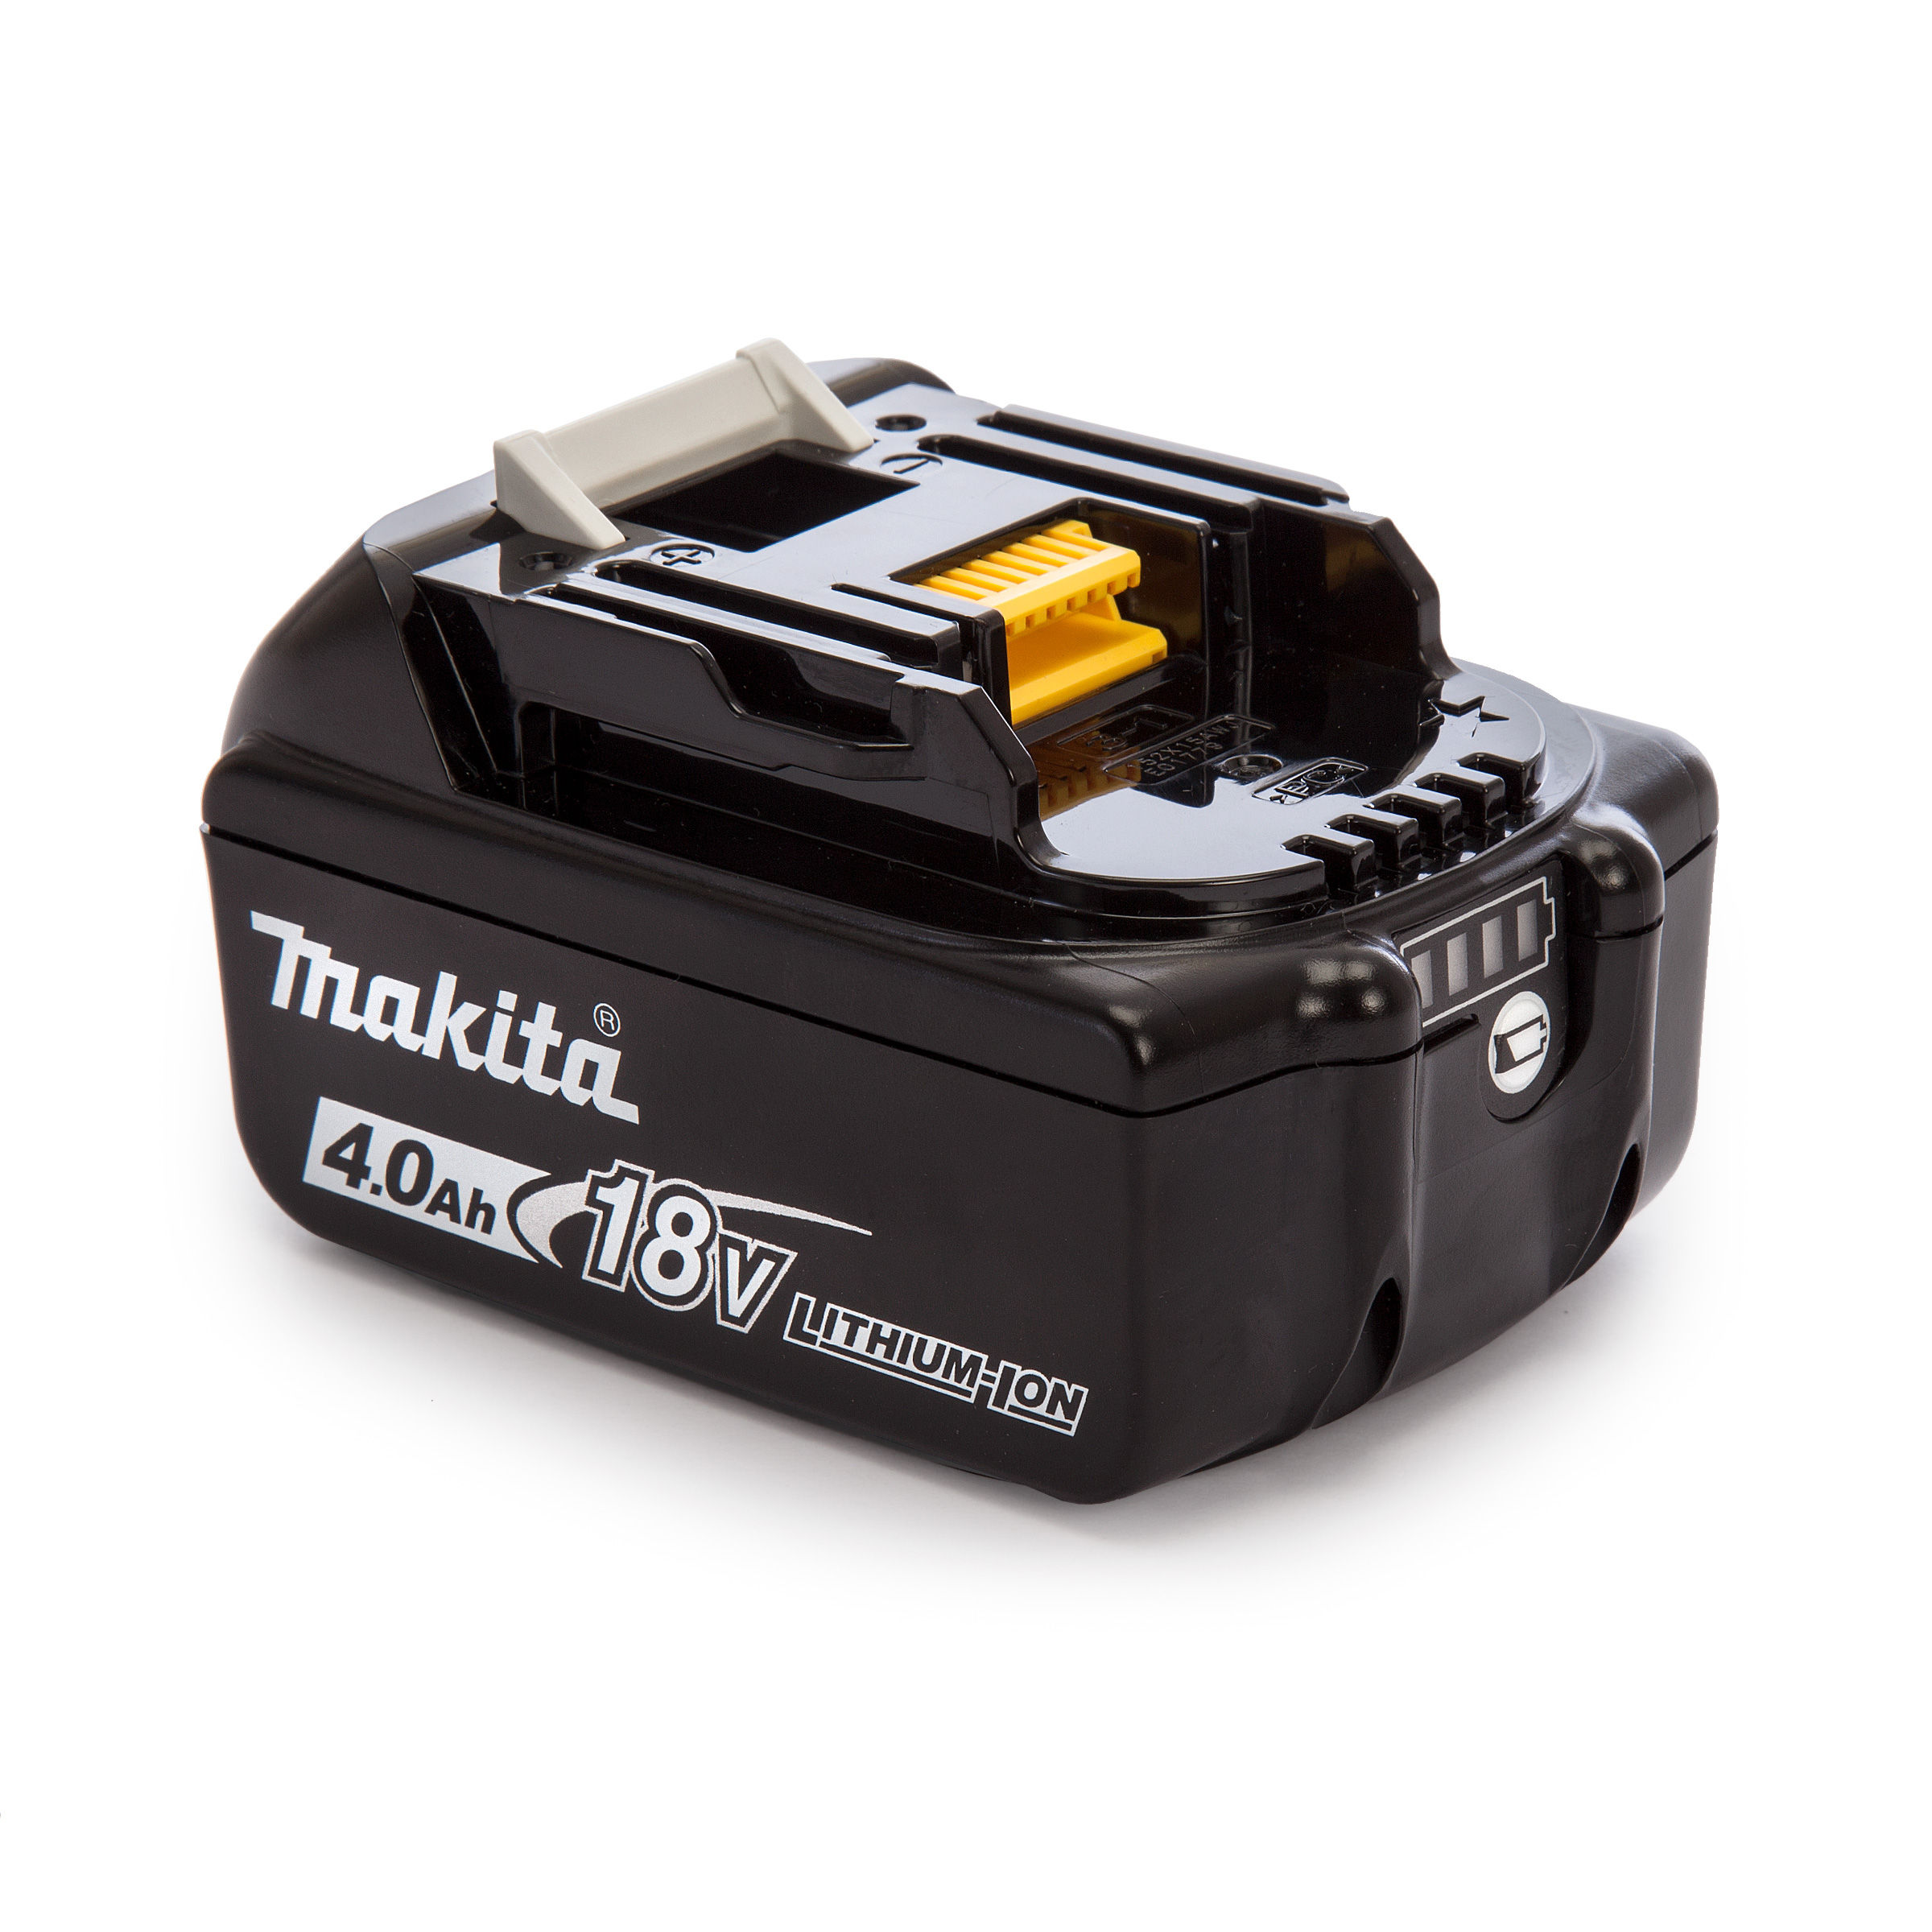 Makita DLX6003M Combo kit 6pcs com 3 bateria 18V 4Ah Li-ion